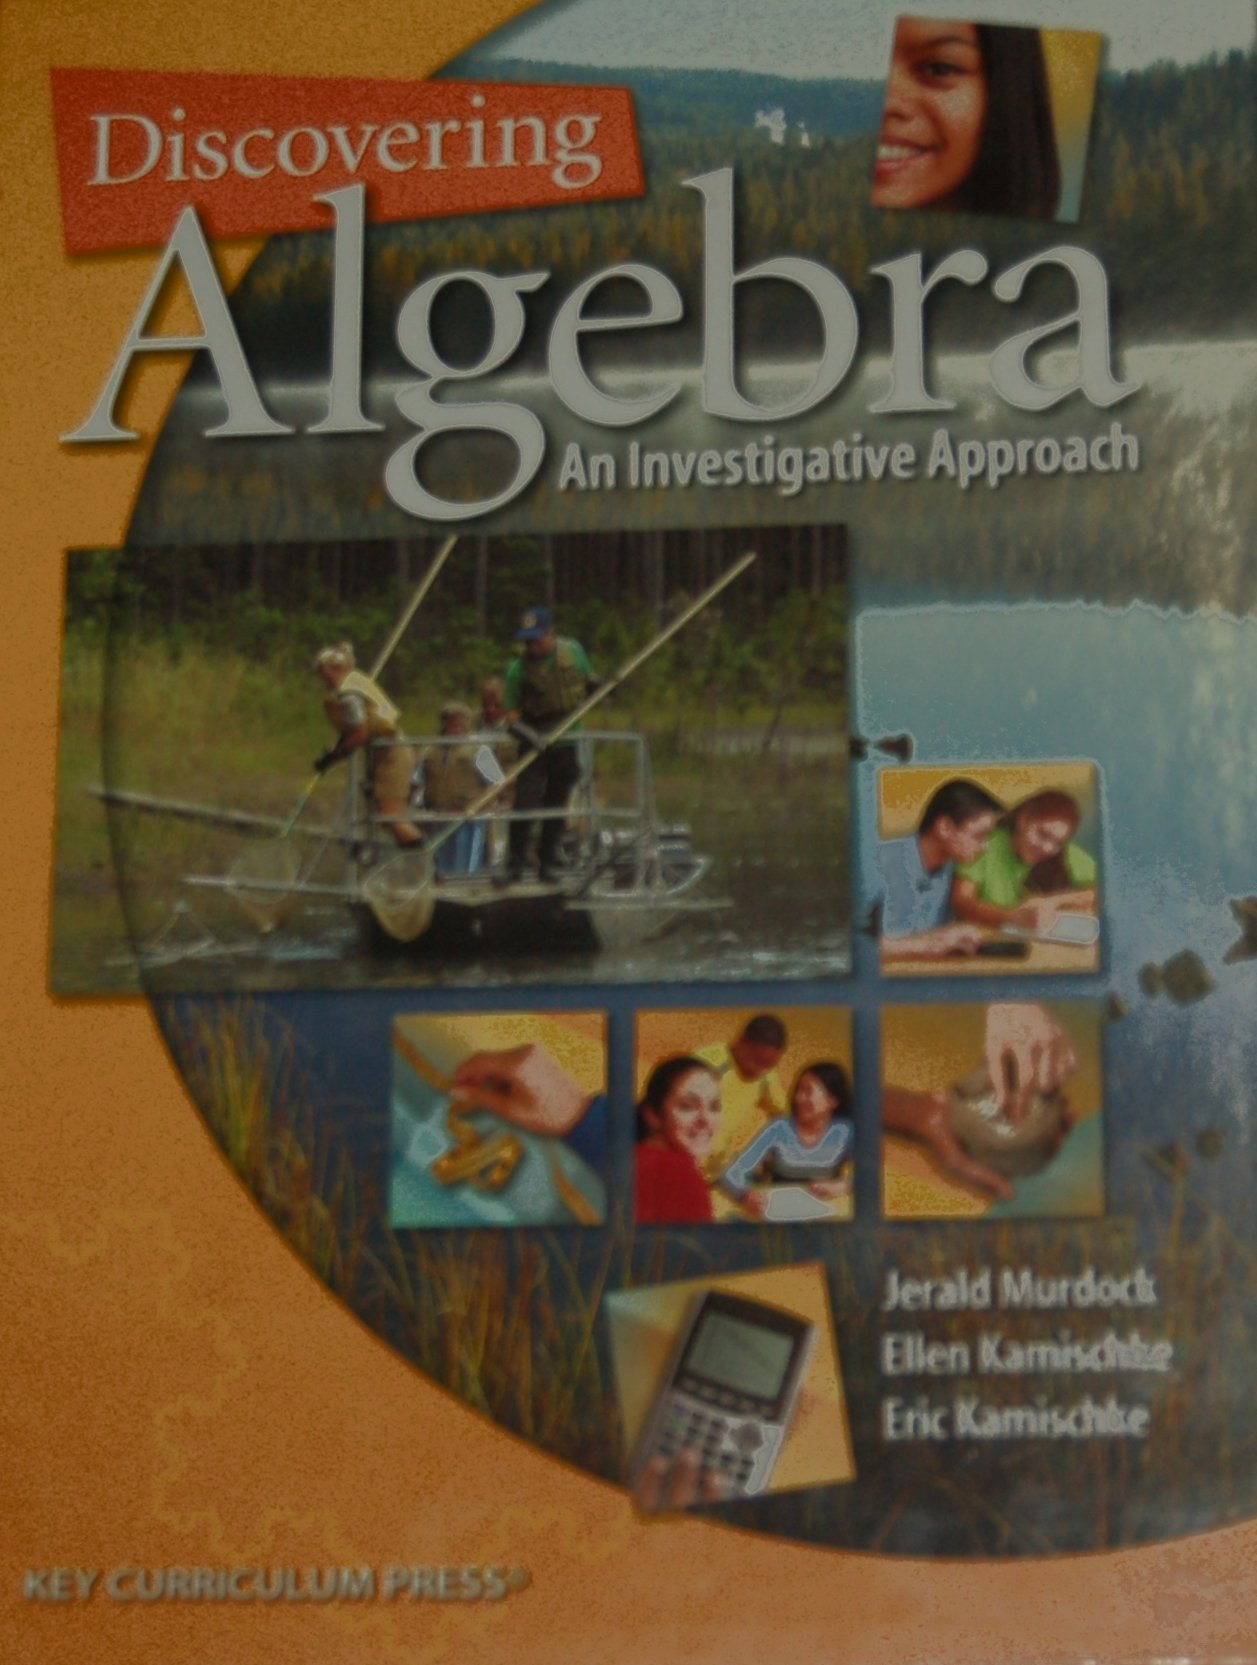 Amazon.com: Discovering Algebra: An Investigative Approach (9781559537636):  Jerald Murdock, Ellen Kamischke, Eric Kamischke: Books